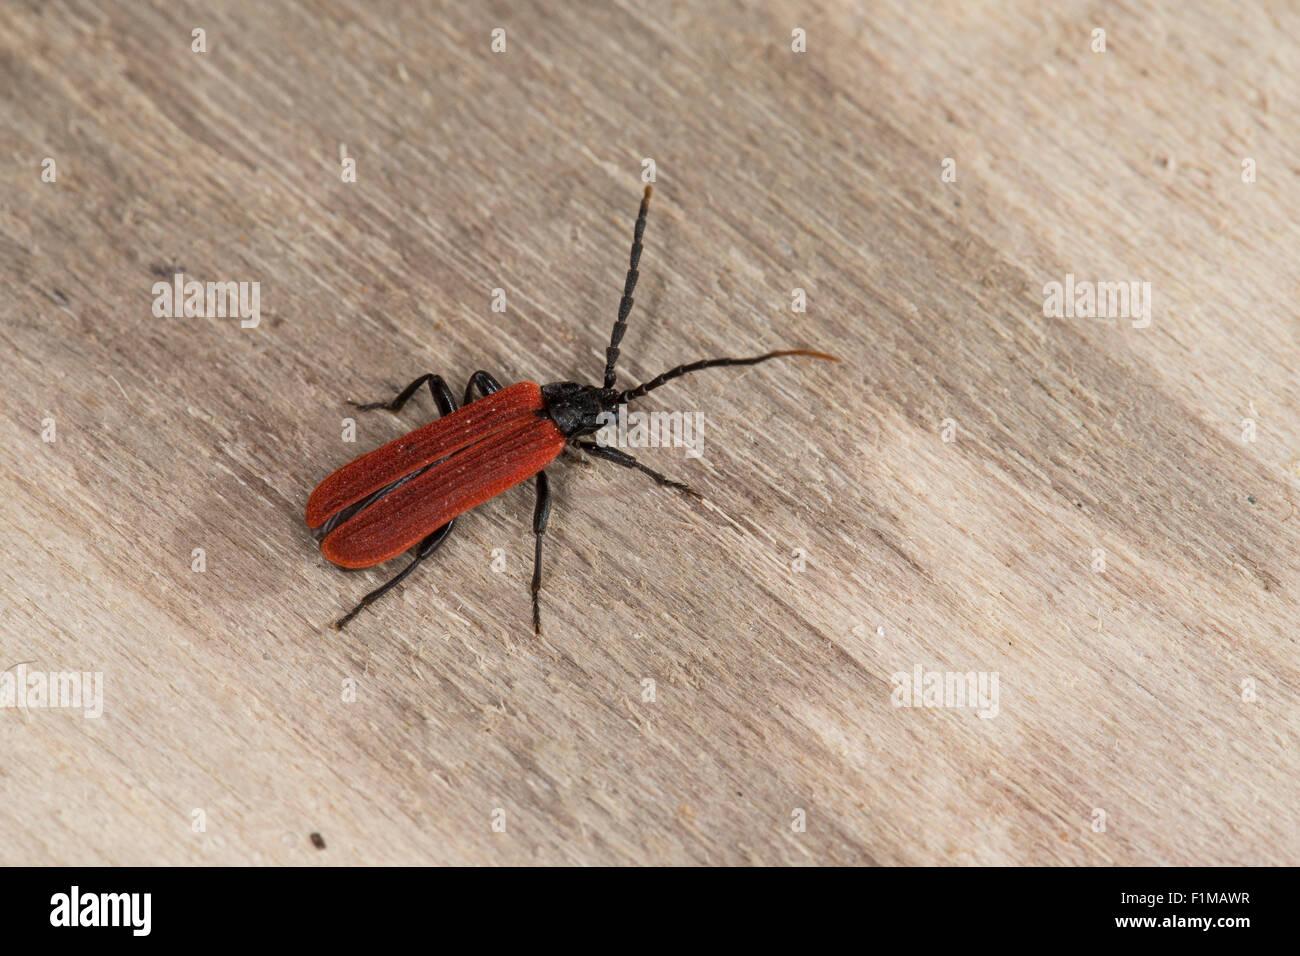 Stunning beetle, net-winged beetle, Black-neck Lycus, Rotdeckenkäfer, Rotdeckenkäfer, Platycis minutus, - Stock Image